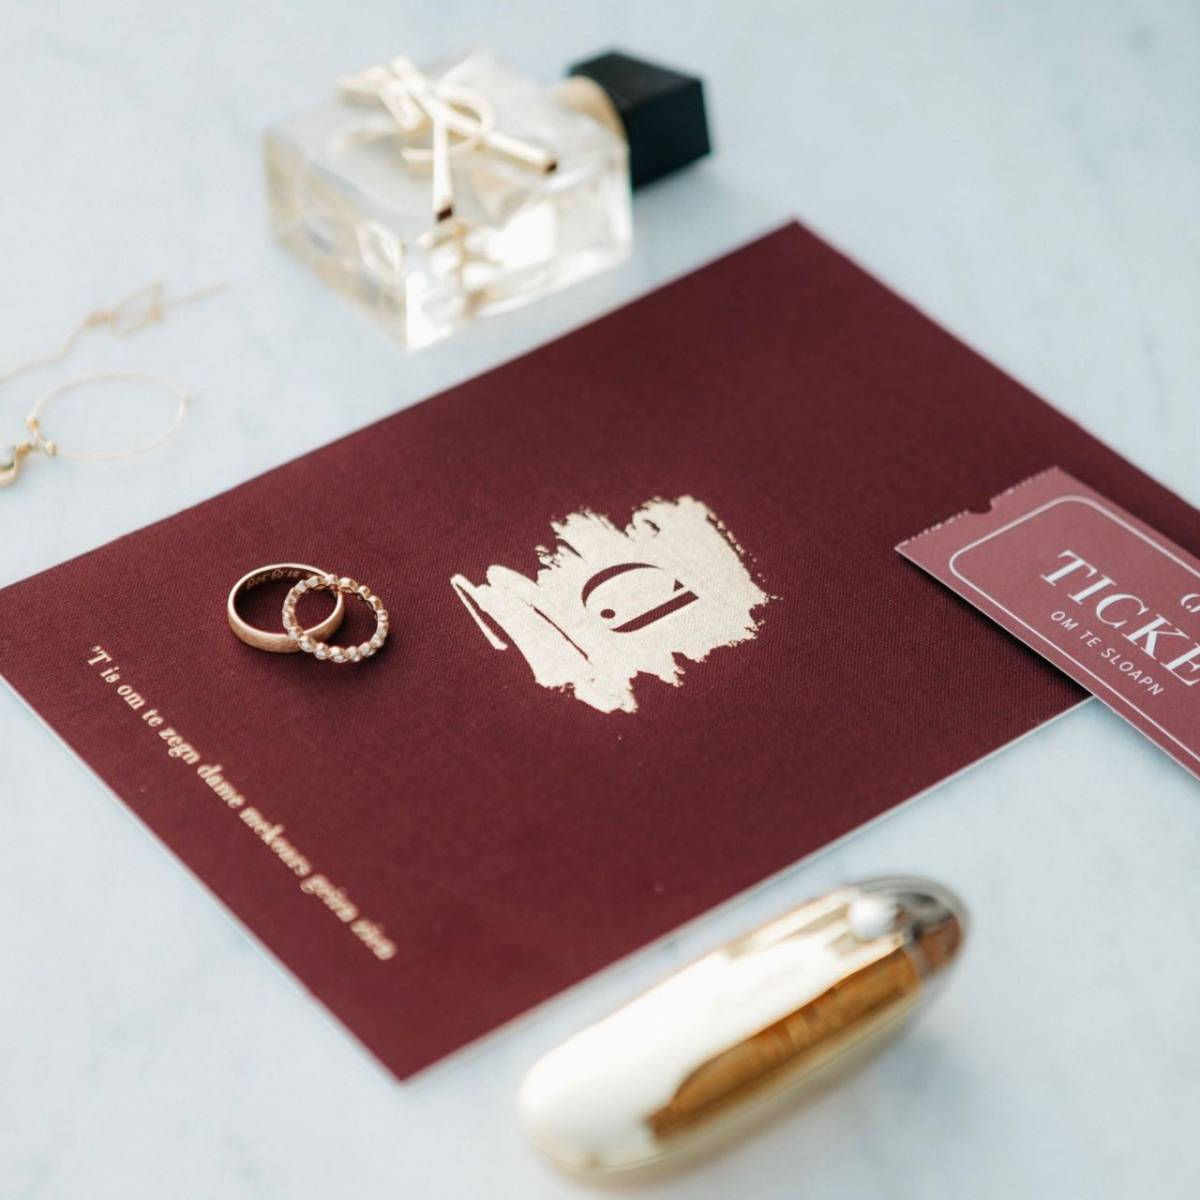 Scarabar - Trouwuitnodiging - Huwelijksuitnodiging - Drukwerk - Huwelijk - Trouw - Bruiloft - House of Weddings - 49